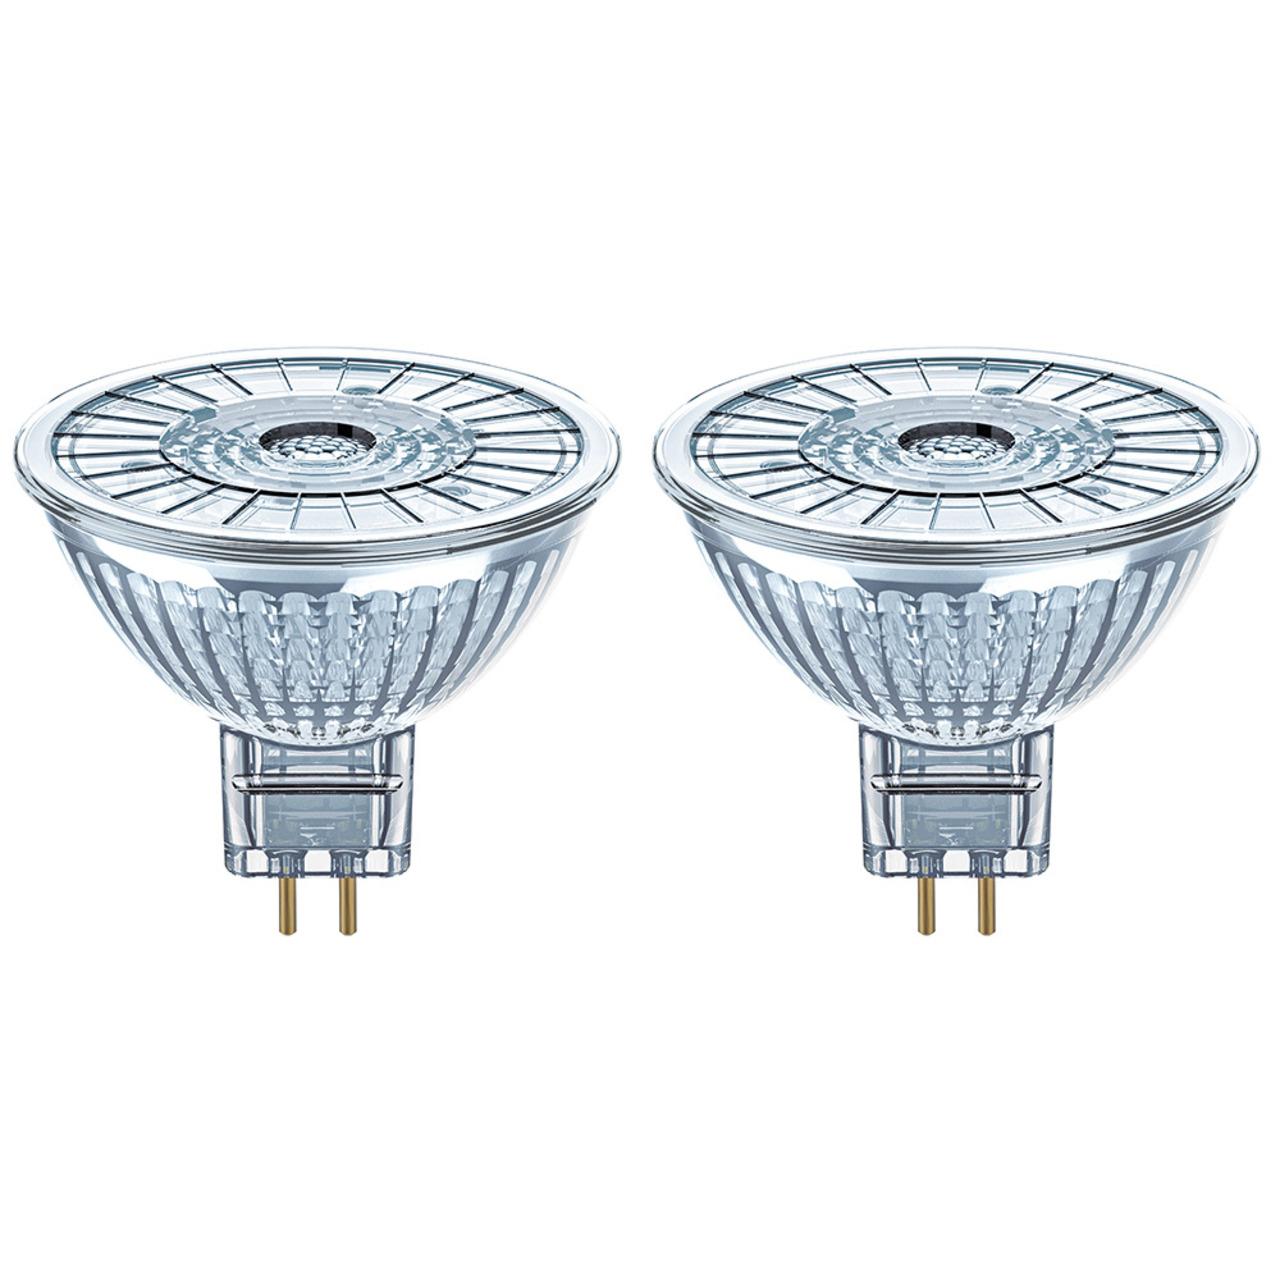 OSRAM LED MULTIPACK 2er Pack 4-6-W-GU5-3-LED-Lampen- warmweiss- 12 V